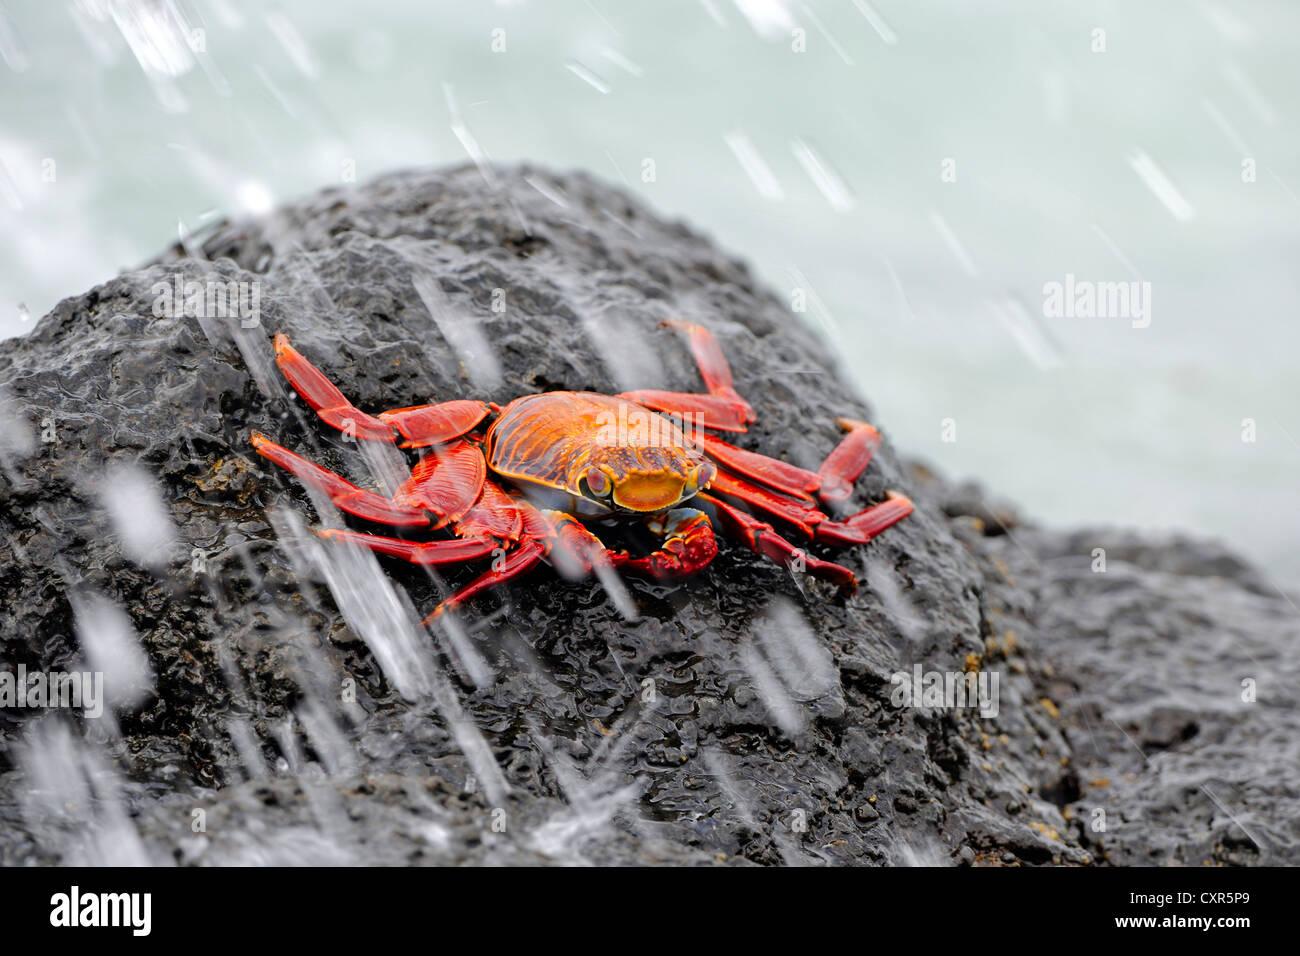 Red rock crab (Grapsus grapsus), in the surf, Santa Cruz Island, Galápagos Islands, Unesco World Heritage Site, - Stock Image